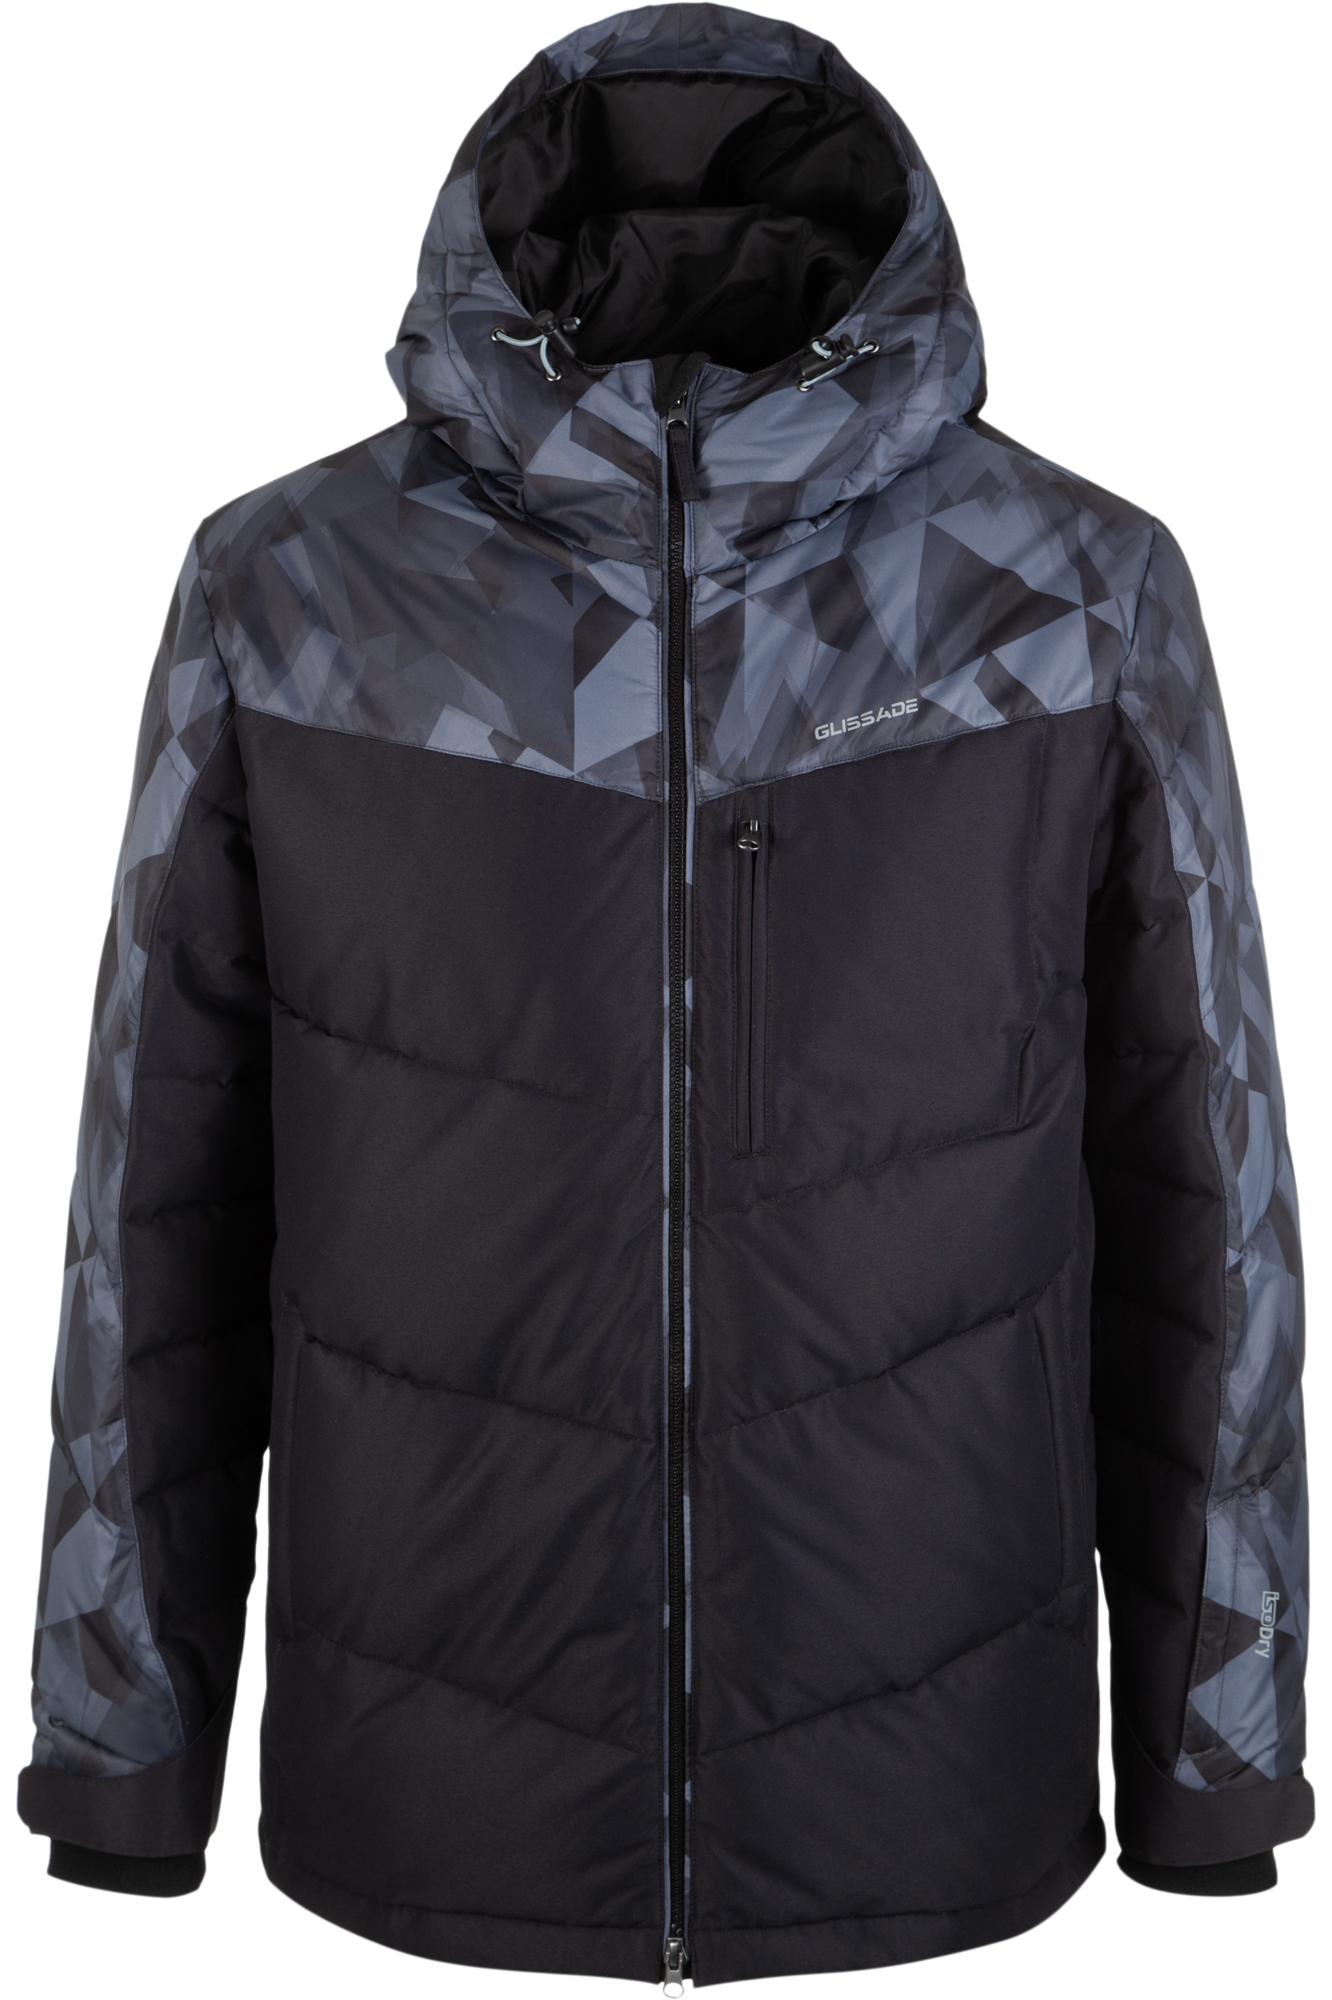 Glissade Куртка утепленная мужская Glissade, размер 56-58 куртка утепленная conso wear conso wear mp002xw0tupn